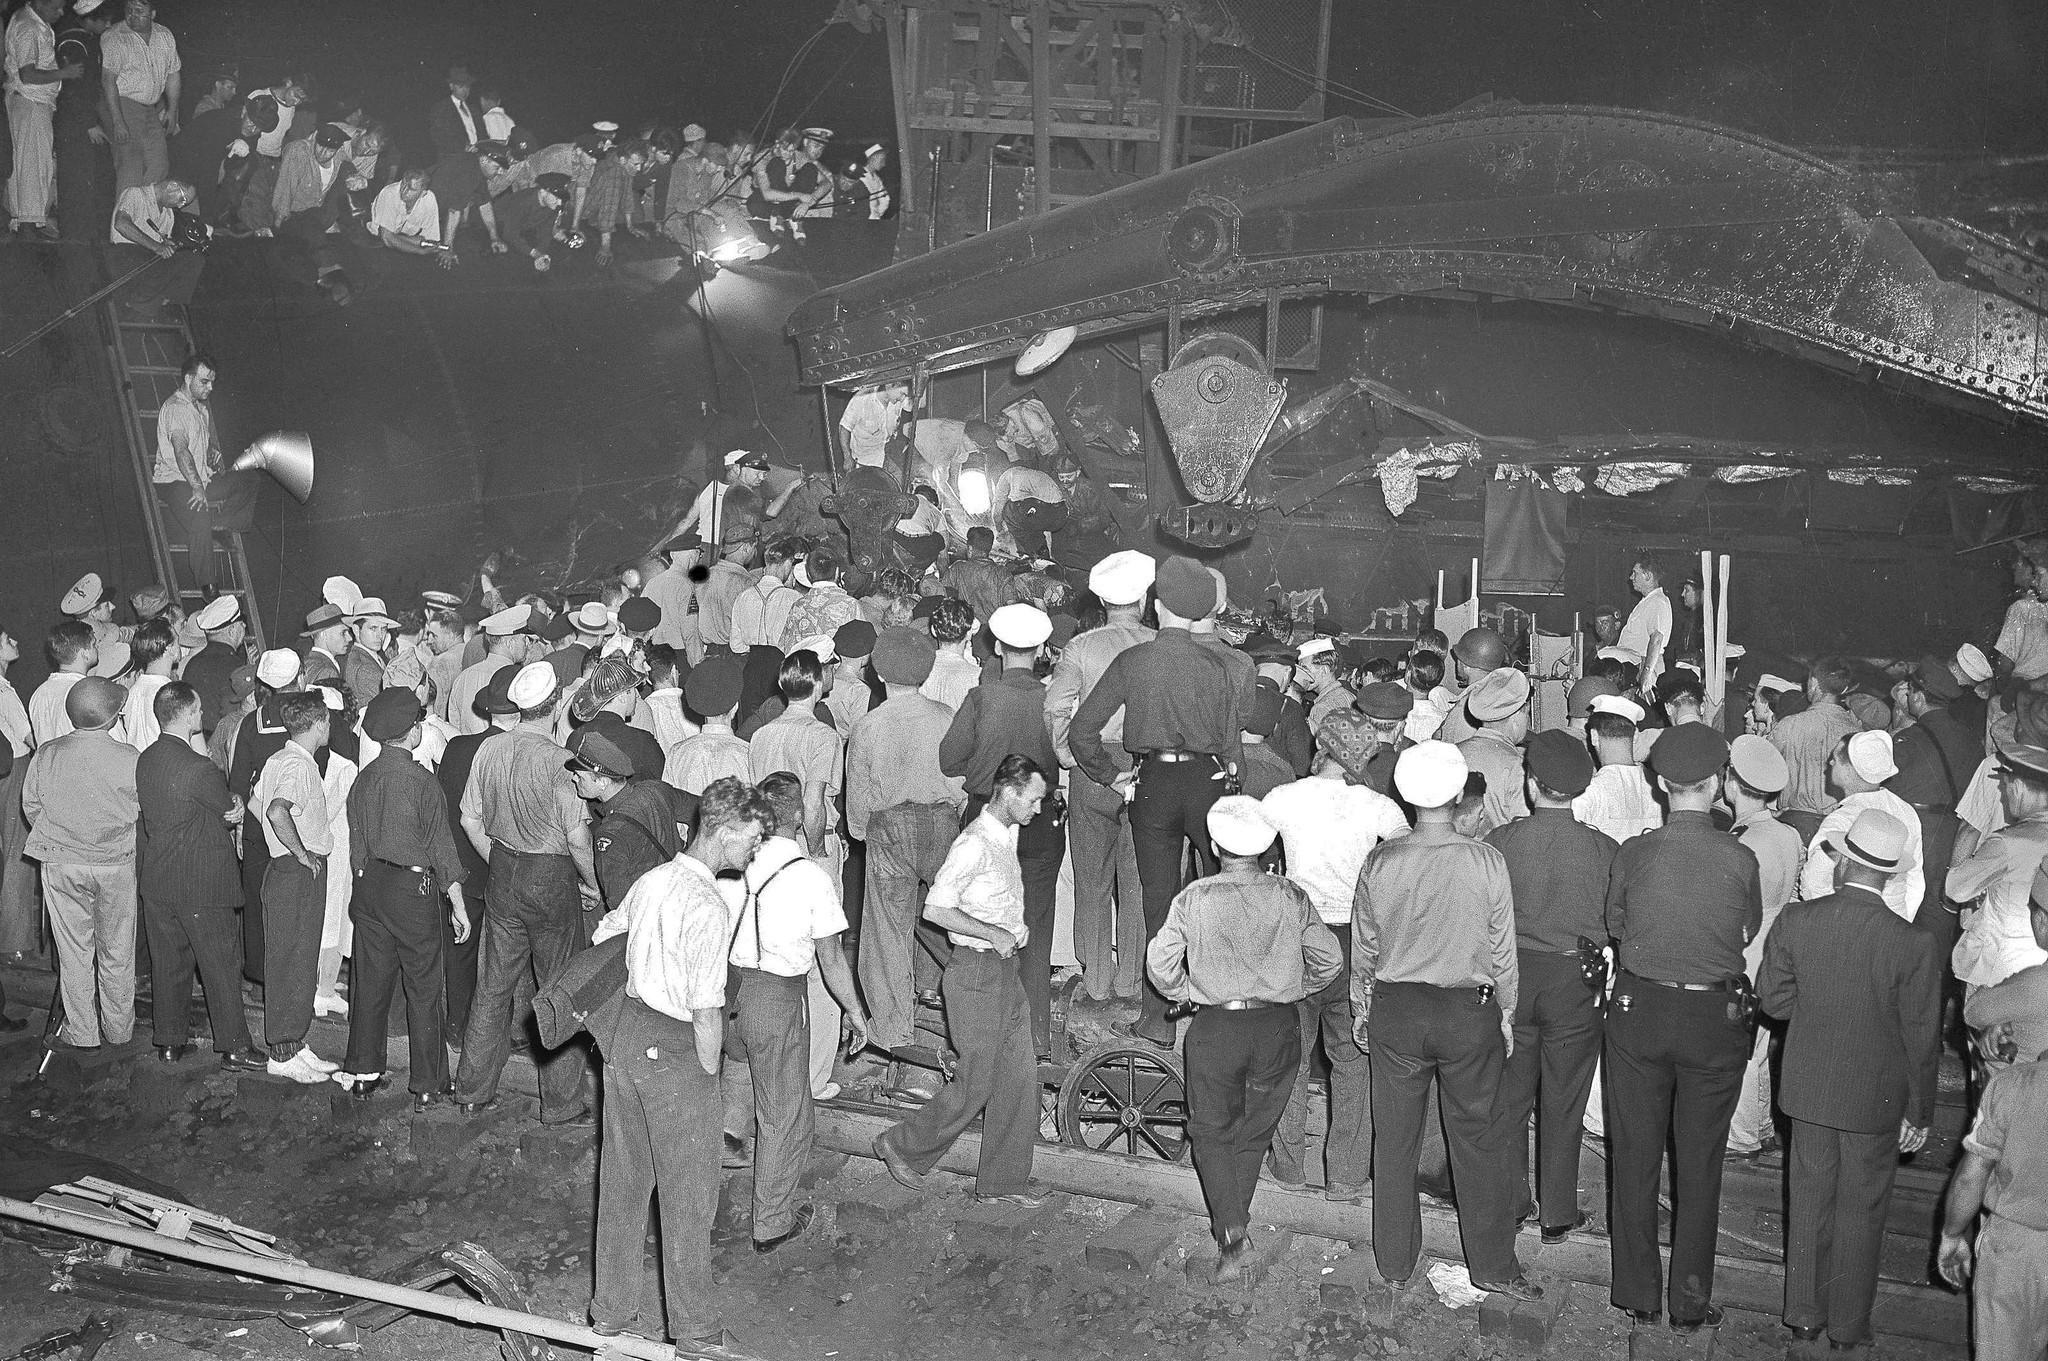 1943 derailment that killed 79 occurred near Amtrak crash - The